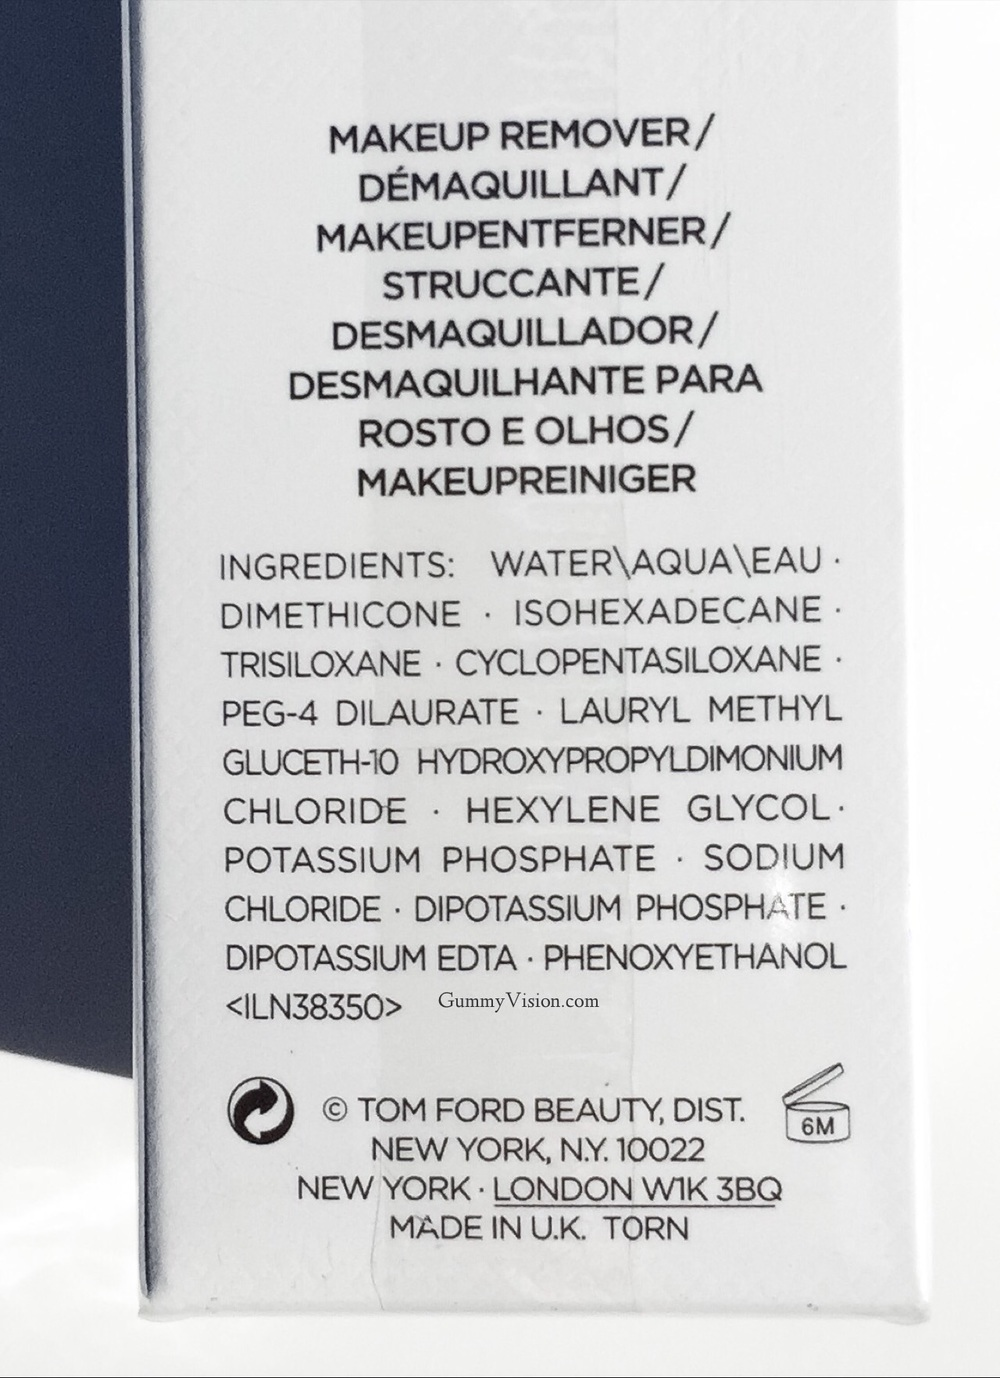 Tom Ford Makeup Remover - www.gummyvision.com